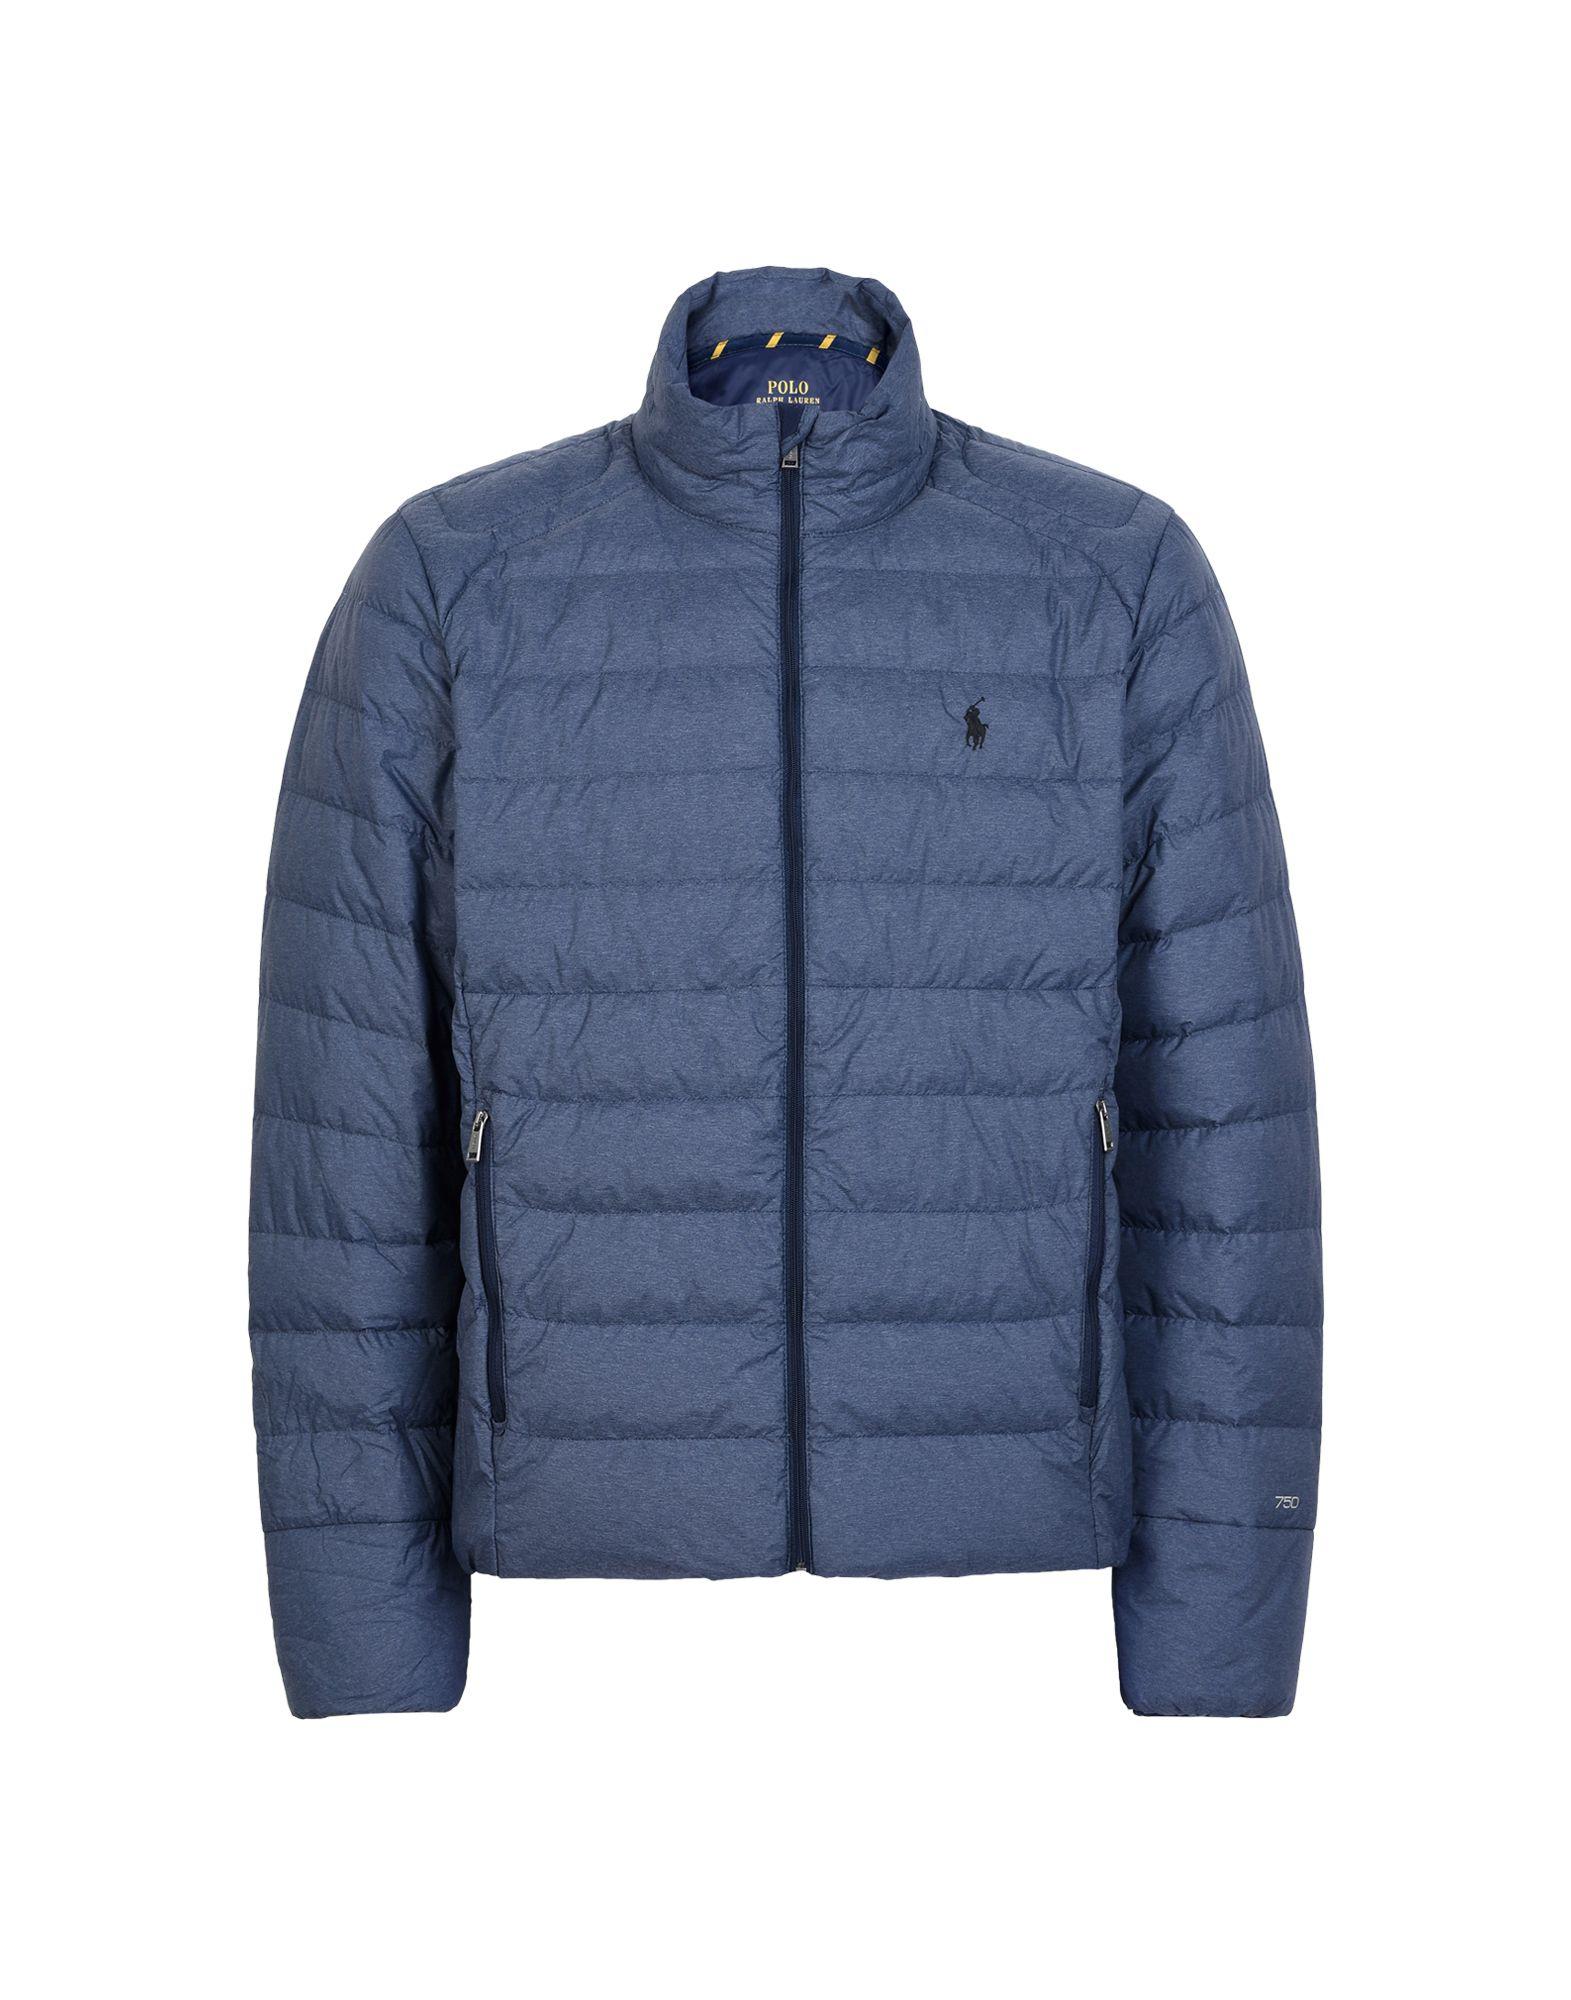 Piumino Polo Ralph Lauren Down Jacket - Uomo - Acquista online su